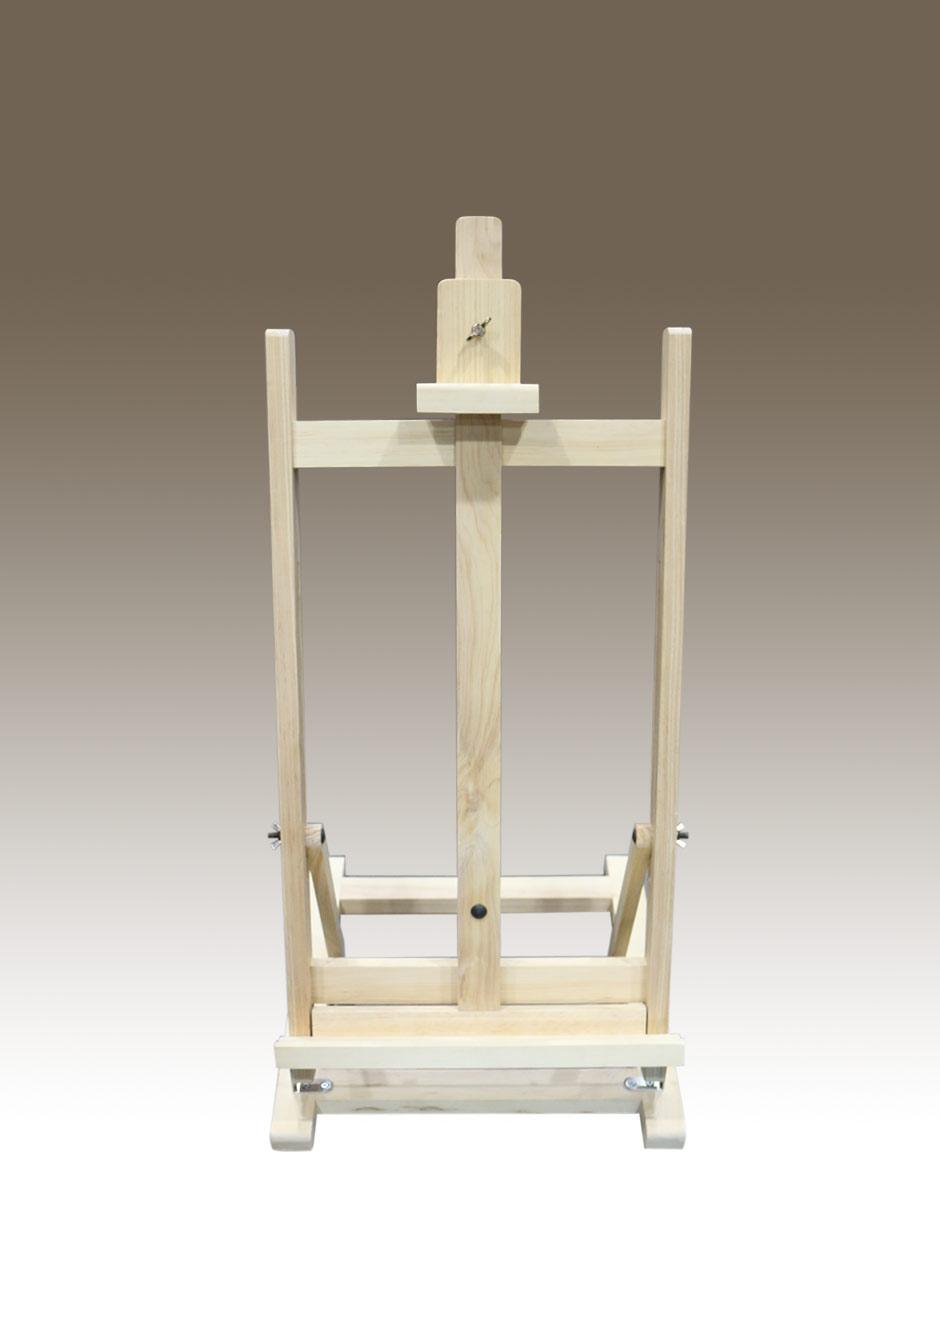 stand-lukis-prapatan-meja-kaki-4-front